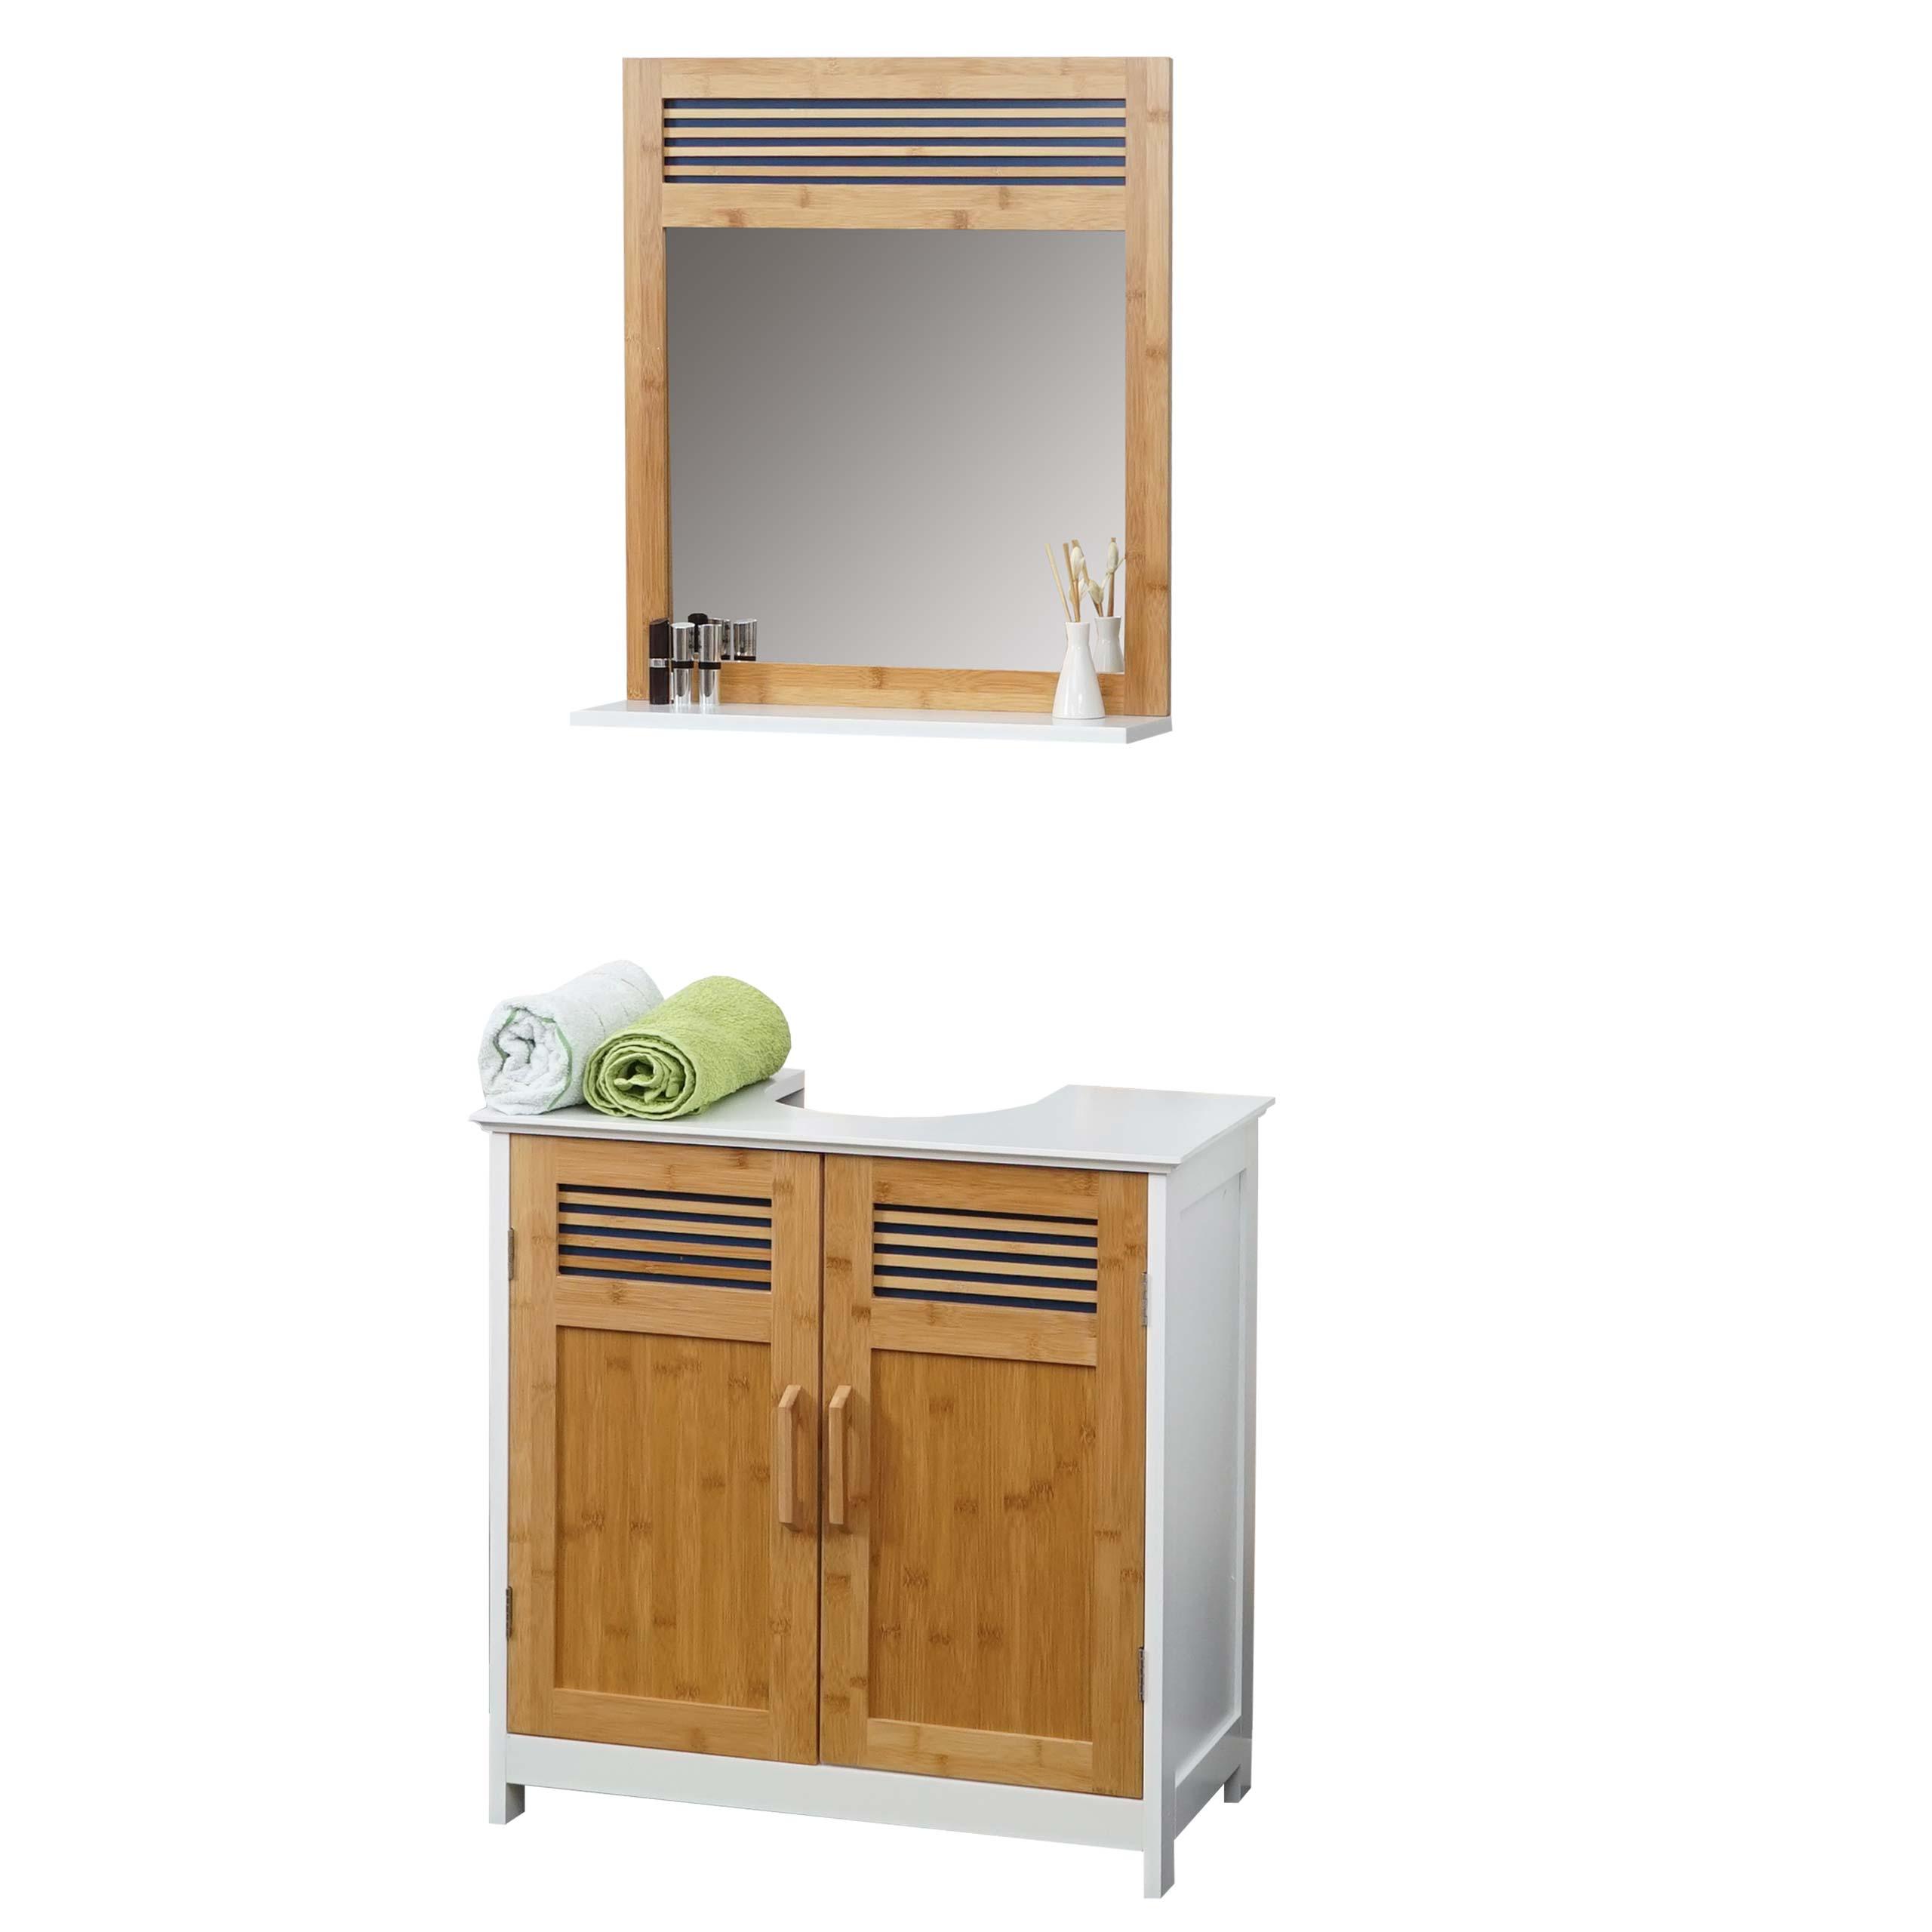 Badm bel hwc a85 badezimmer badschrank badset bambus wei ebay - Bambus badezimmer ...